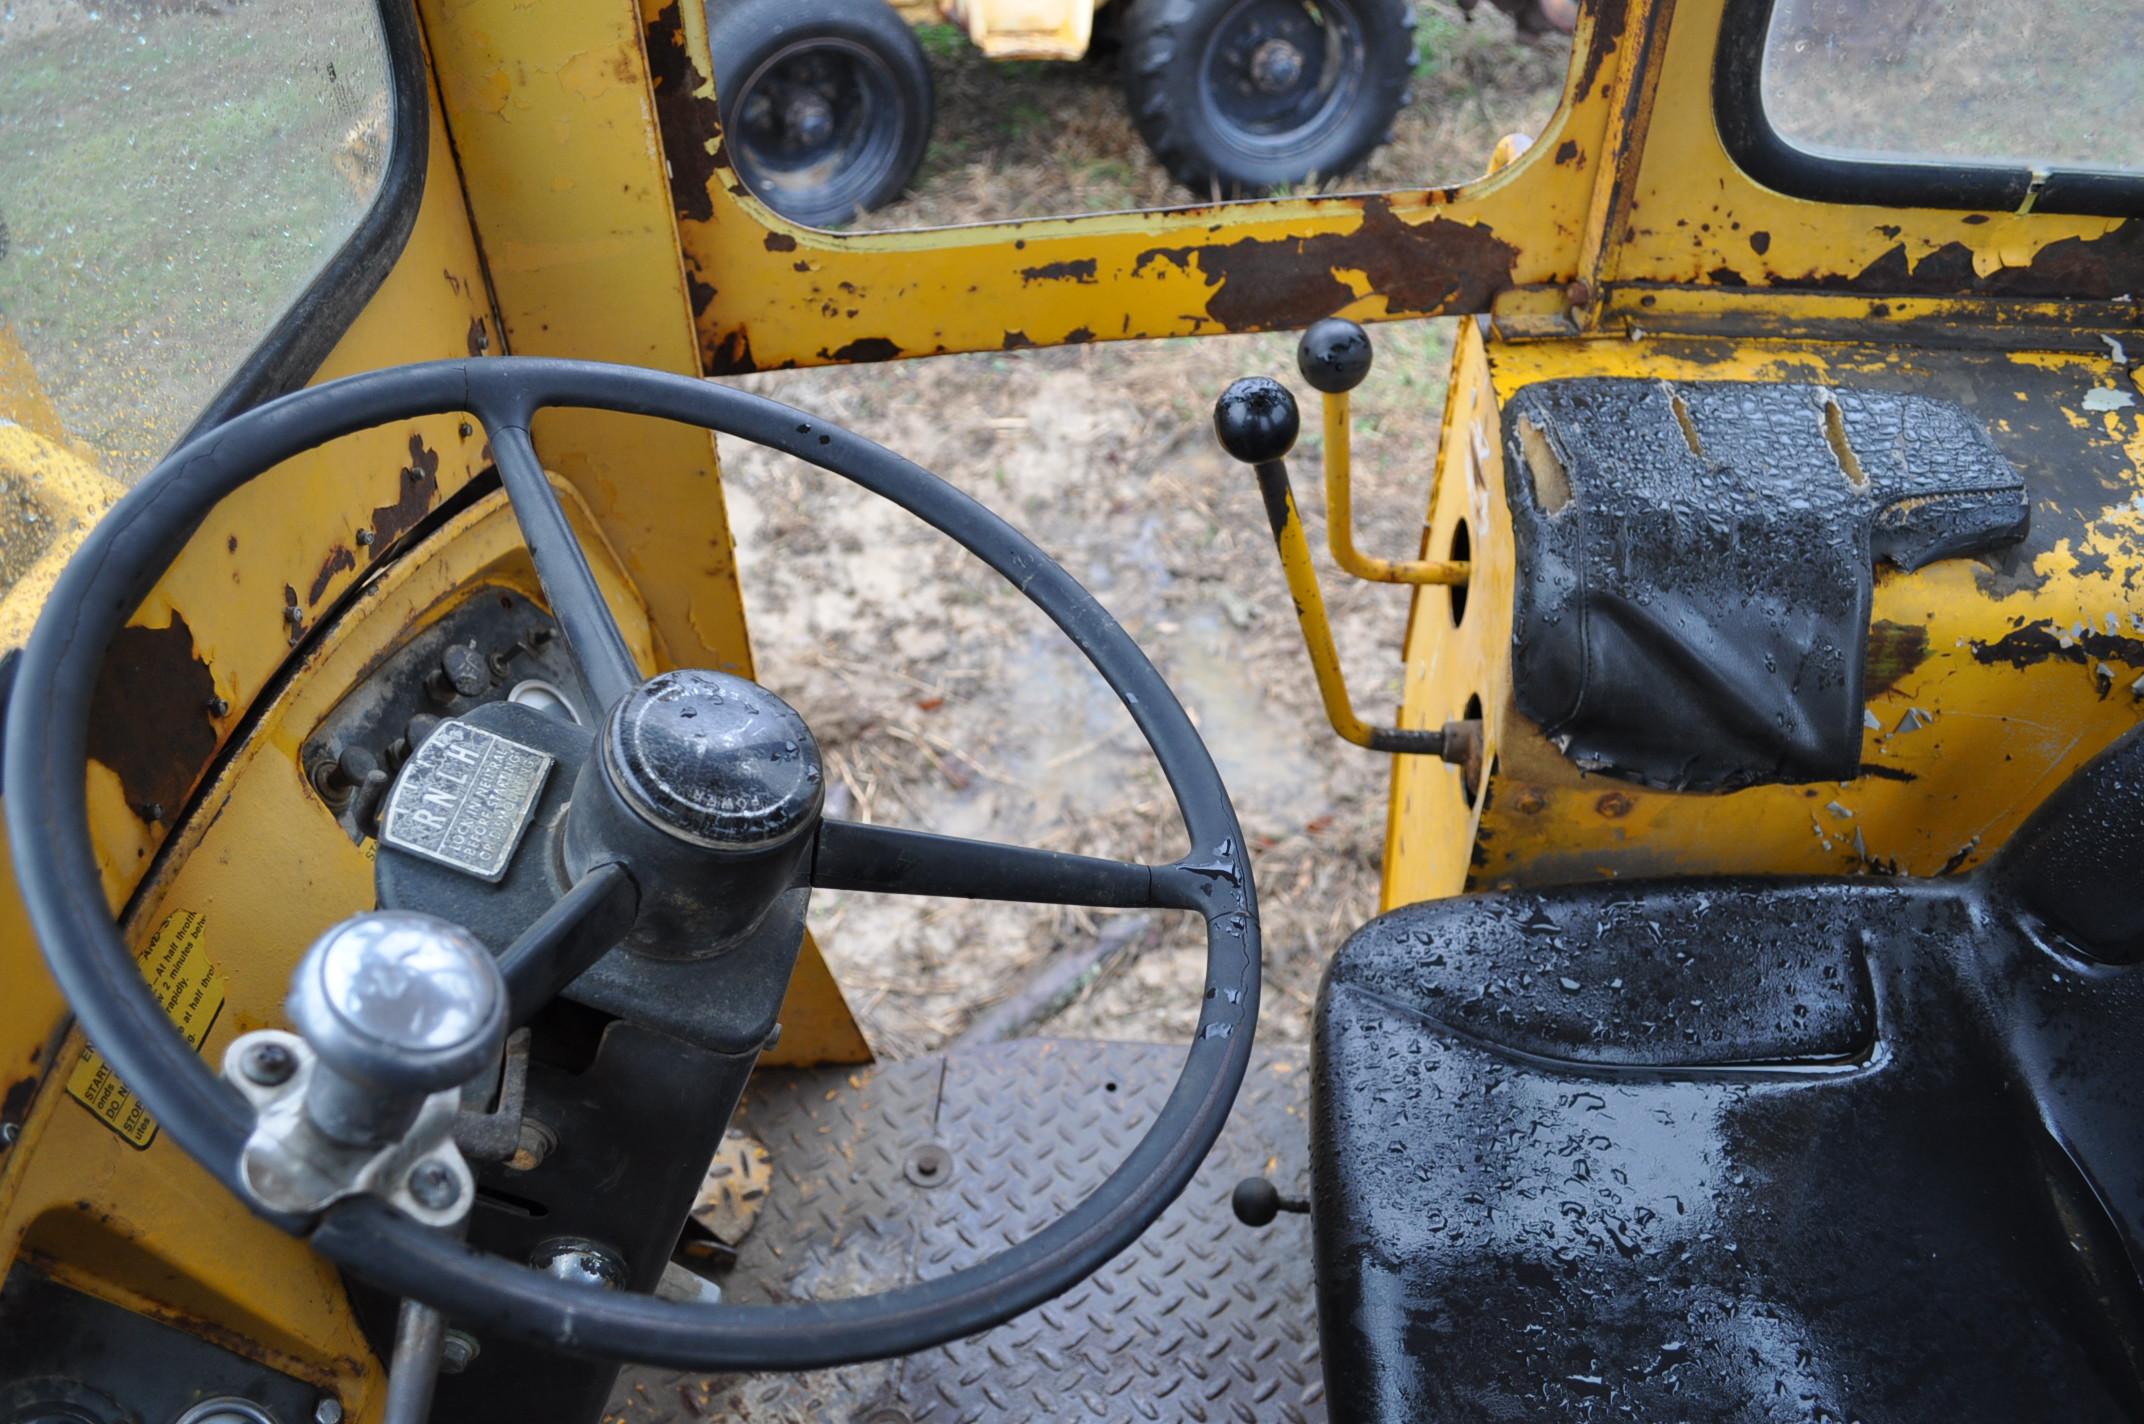 John Deere 544 Payloader, 17.5-25 tires, shows 1074 hrs, SN 0767621 - Image 13 of 16